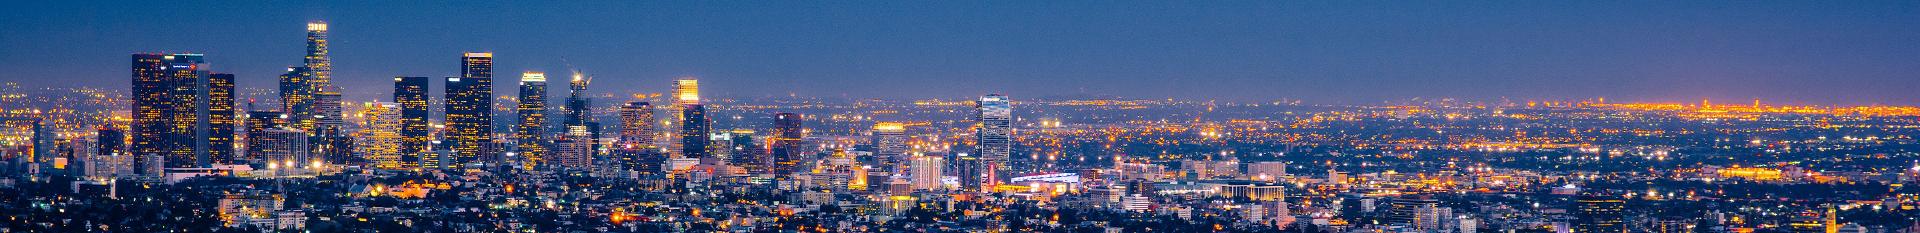 Los Angeles banner 1